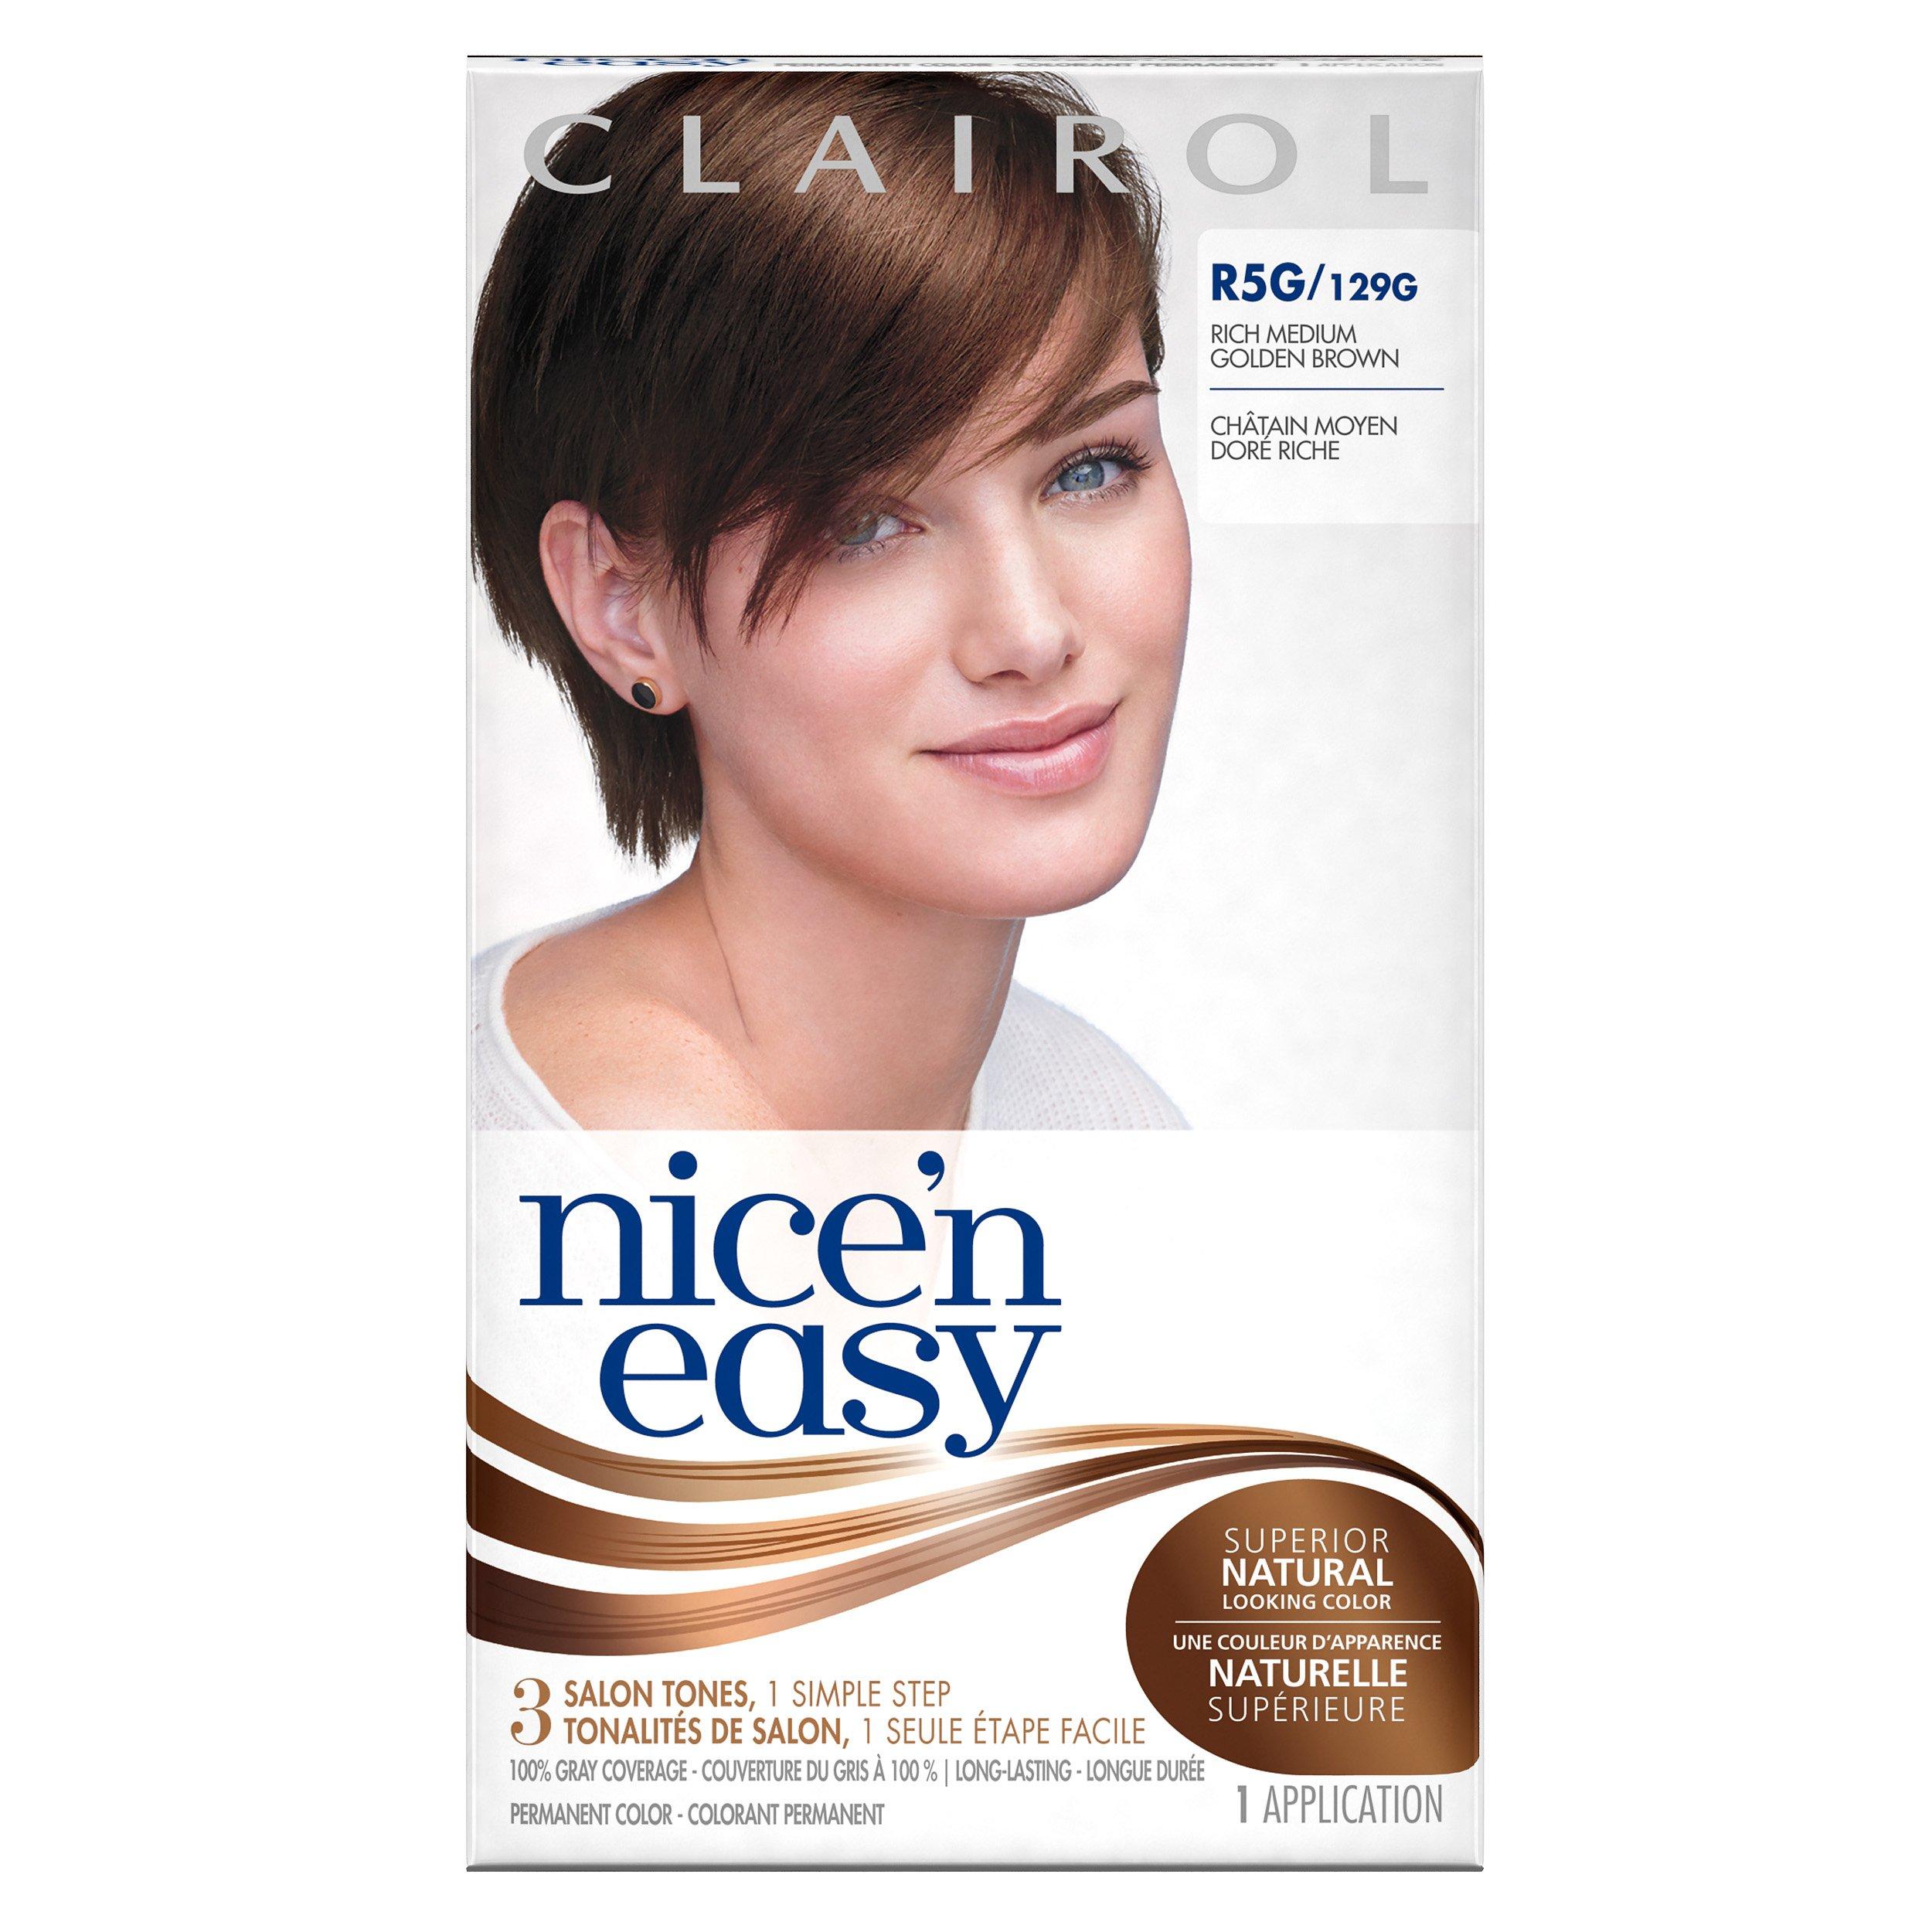 Clairol Nice 'n Easy R5G 129G Rich Medium Golden Brown 1 Kit (Pack of 12)